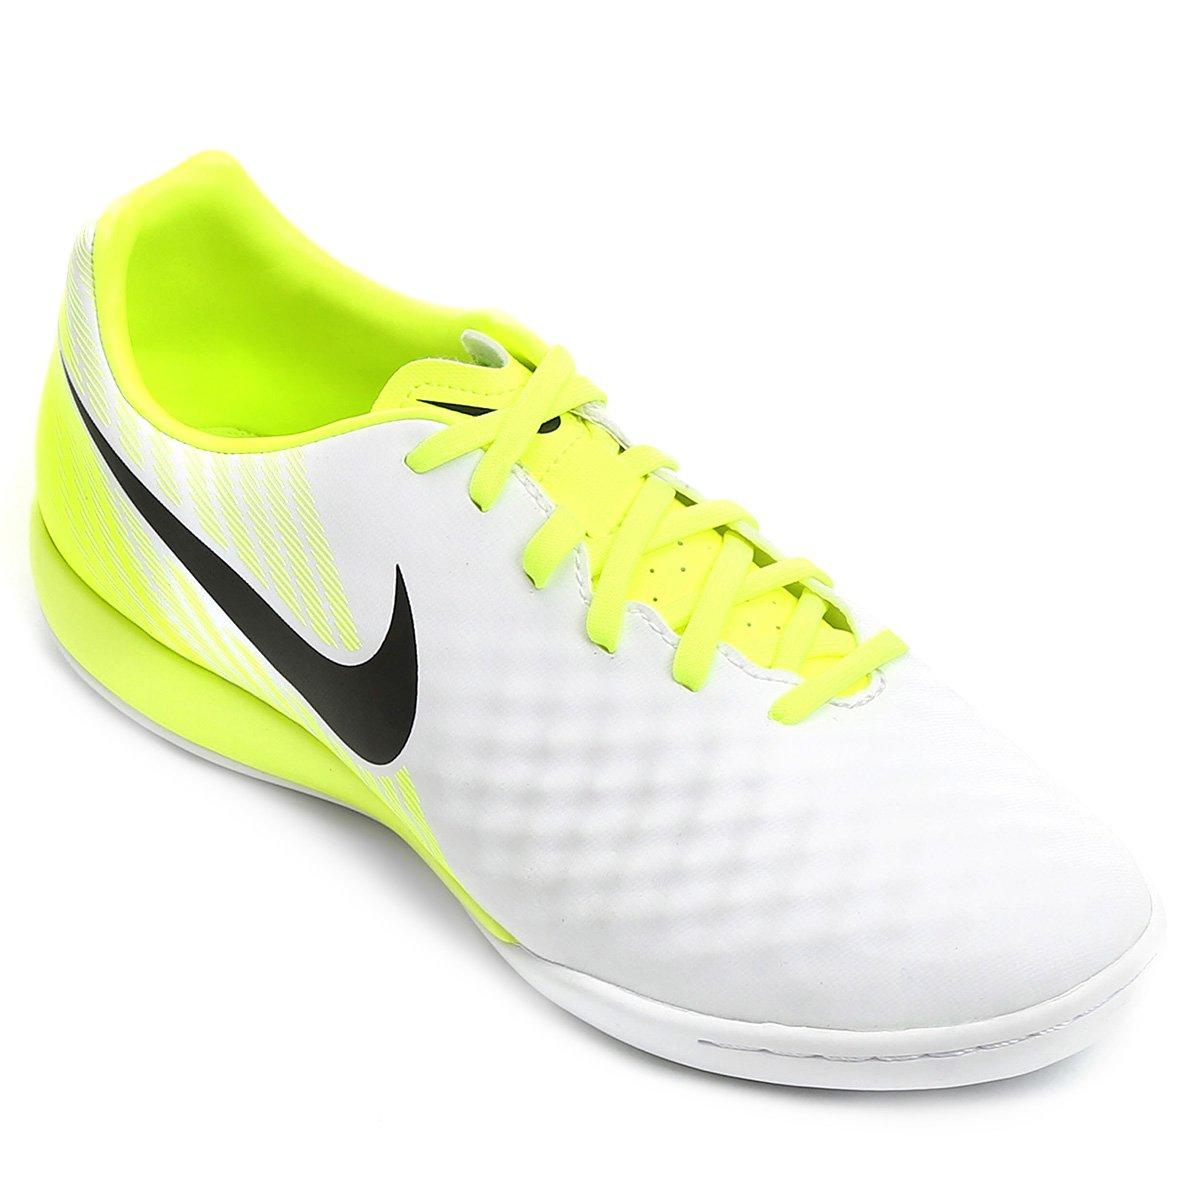 59cf40ac89 Chuteira Futsal Nike Magista Onda II IC Masculina - Compre Agora ...